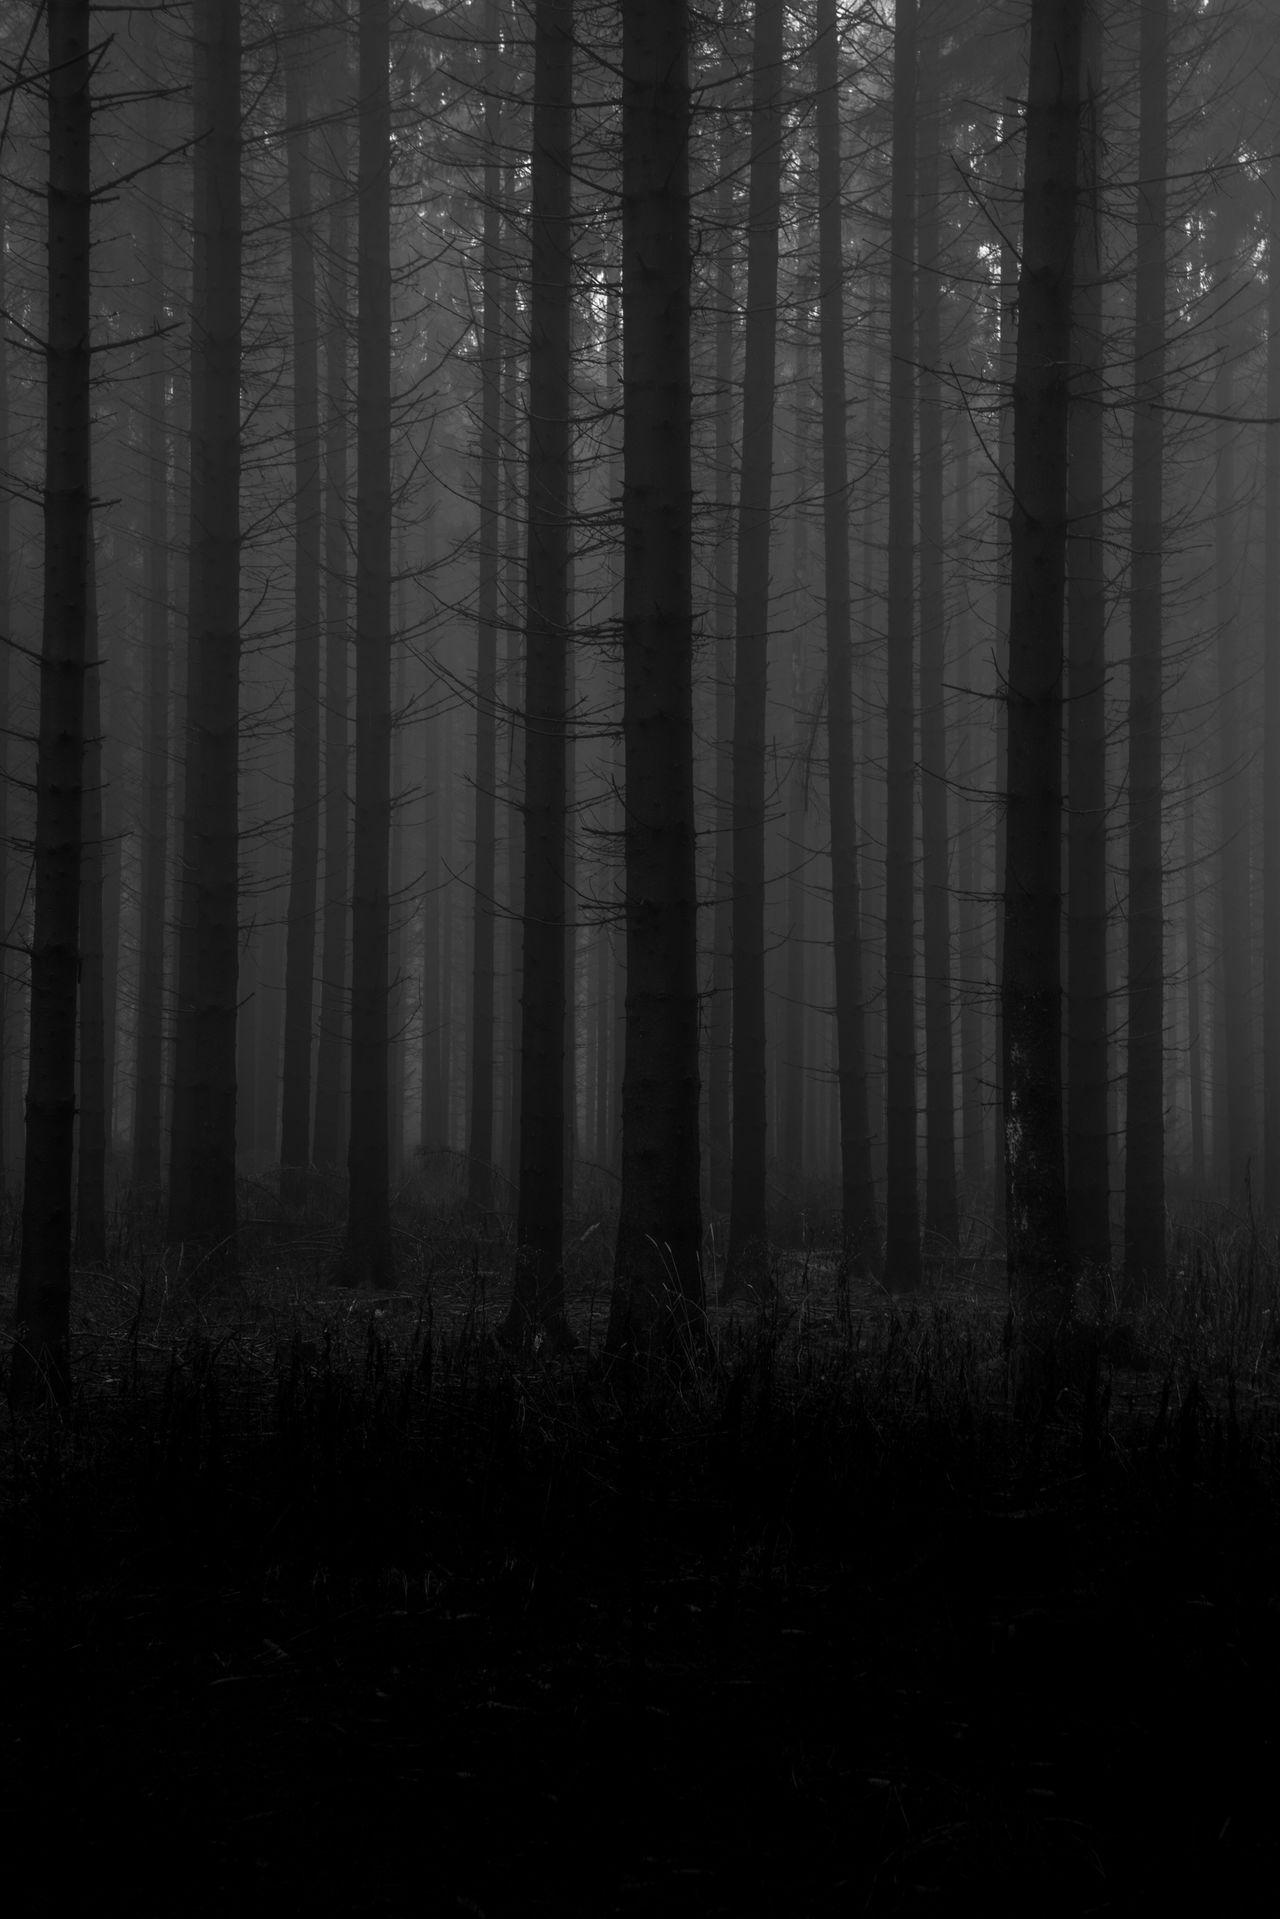 Lost. Forest Tree Nature WoodLand Tree Trunk Fog Woods No People Outdoors Day Creepy Dark Dark Photography Hungary Bükk Nationalpark Hungary Bükk Bükk National Park Magyarország Miskolc Misty Mist Nature_collection Naturelovers TreePorn Traveling